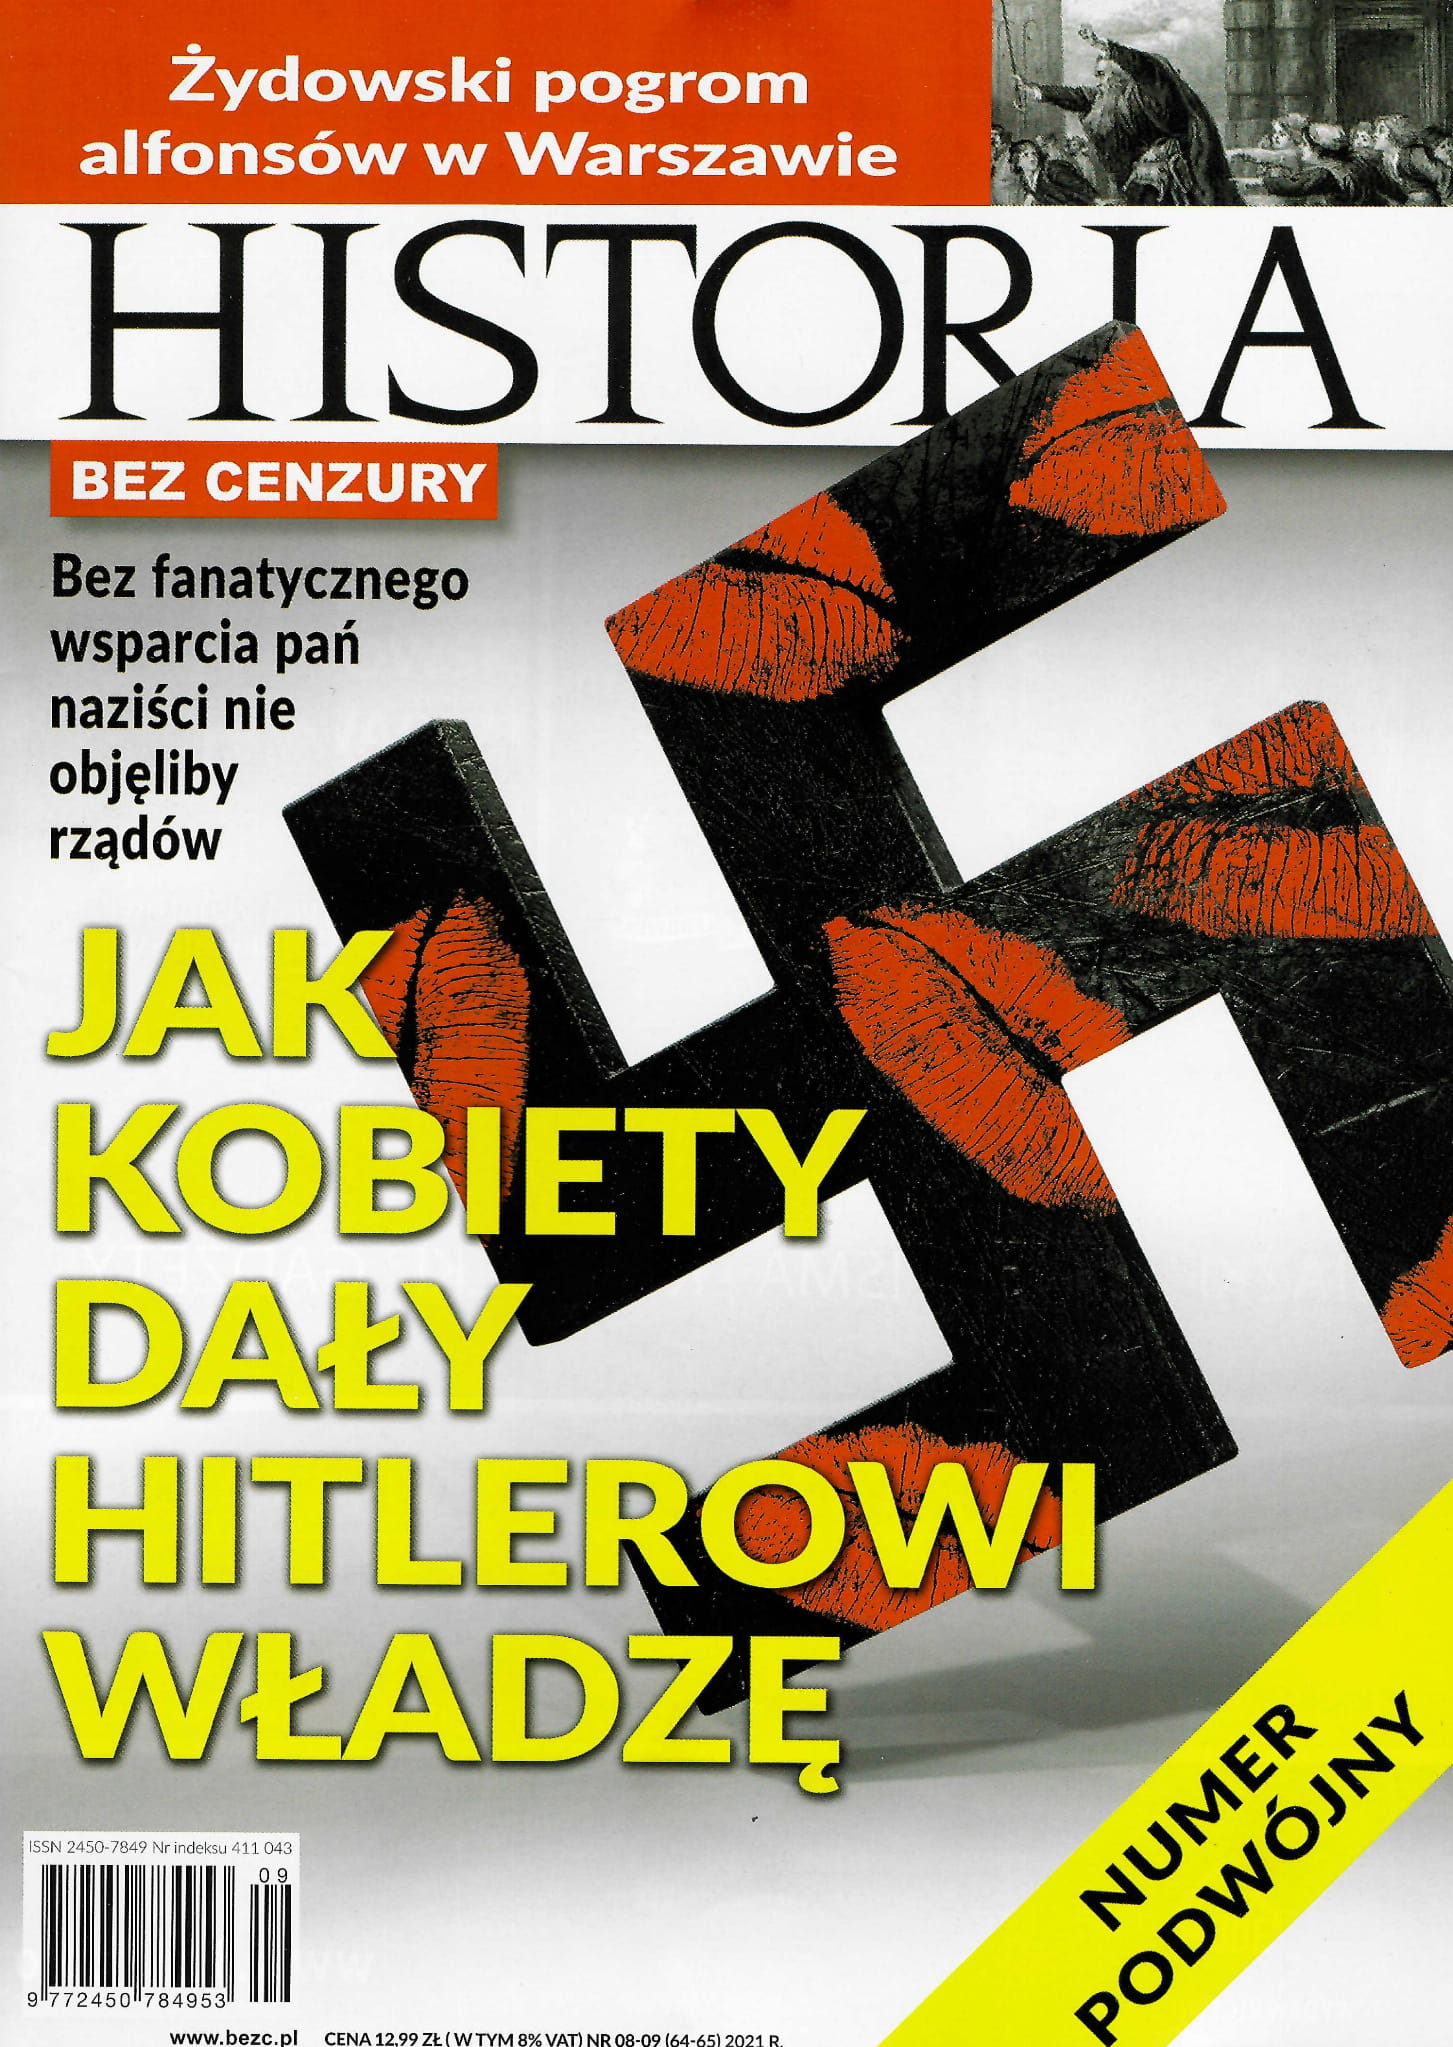 Image of Historia bez cenzury nr 08-09 (64-65) 2021 r.